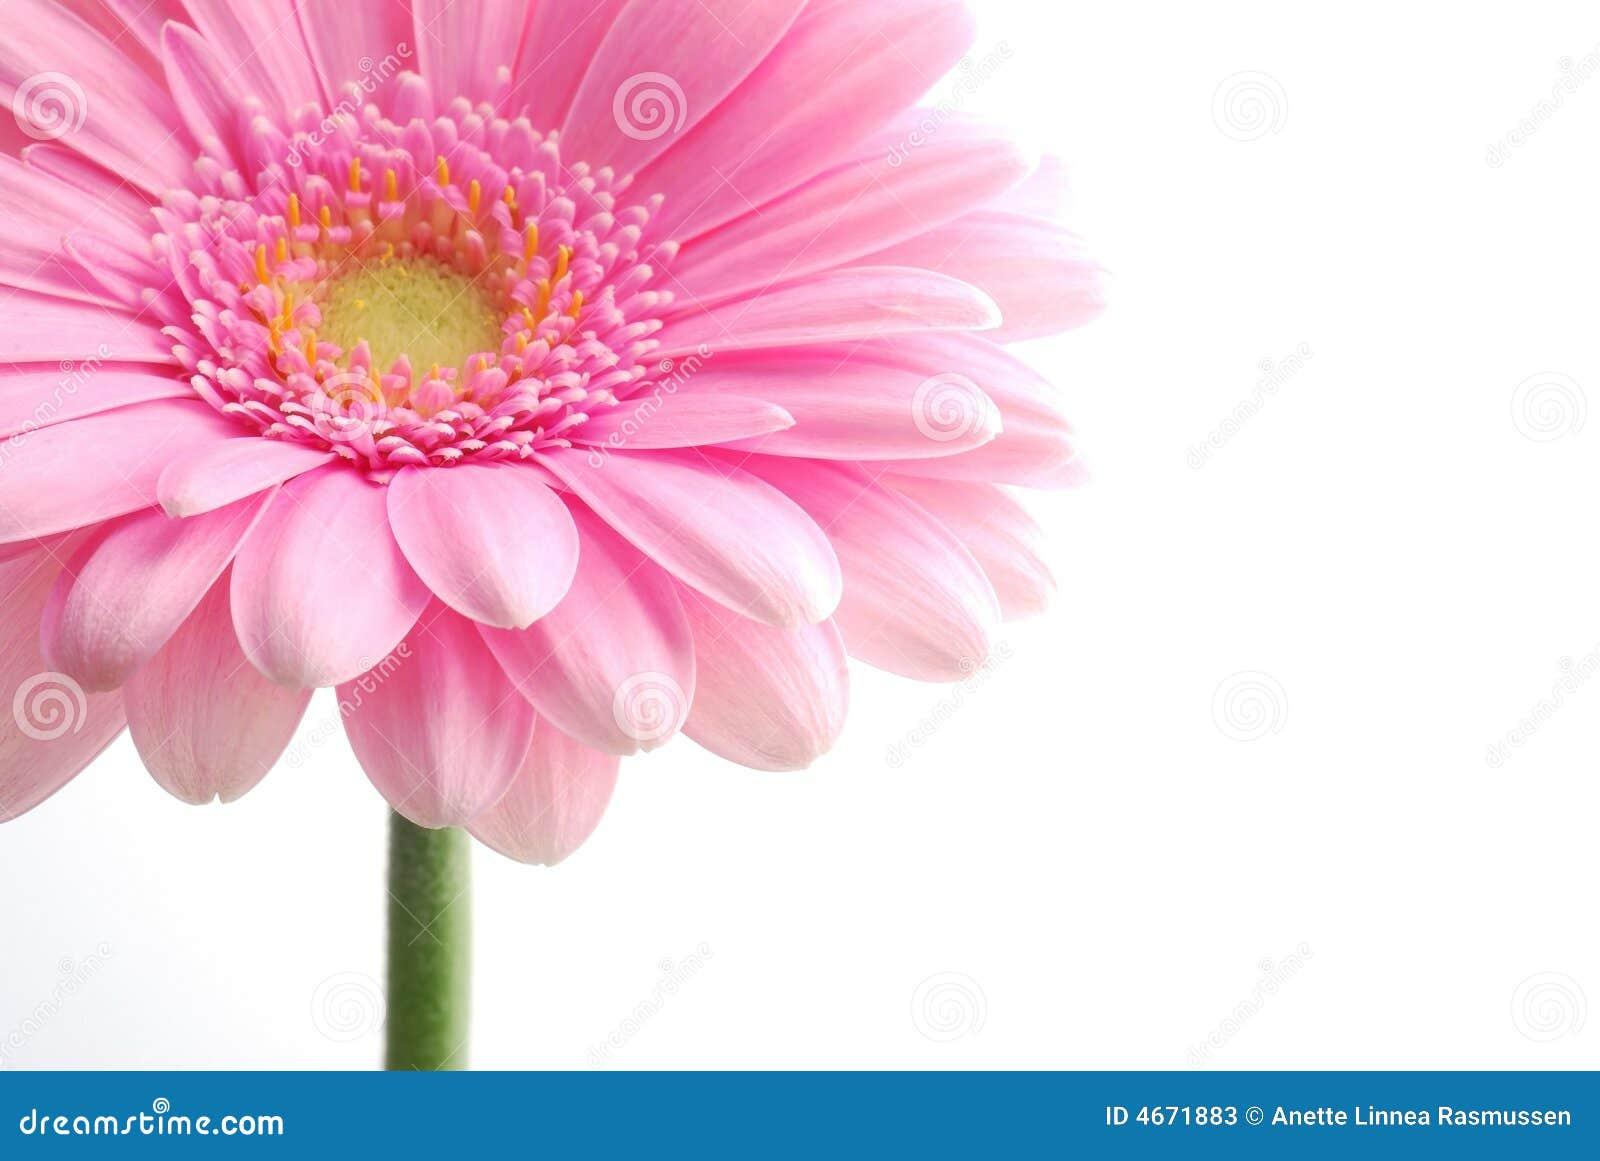 Single pink gerbera